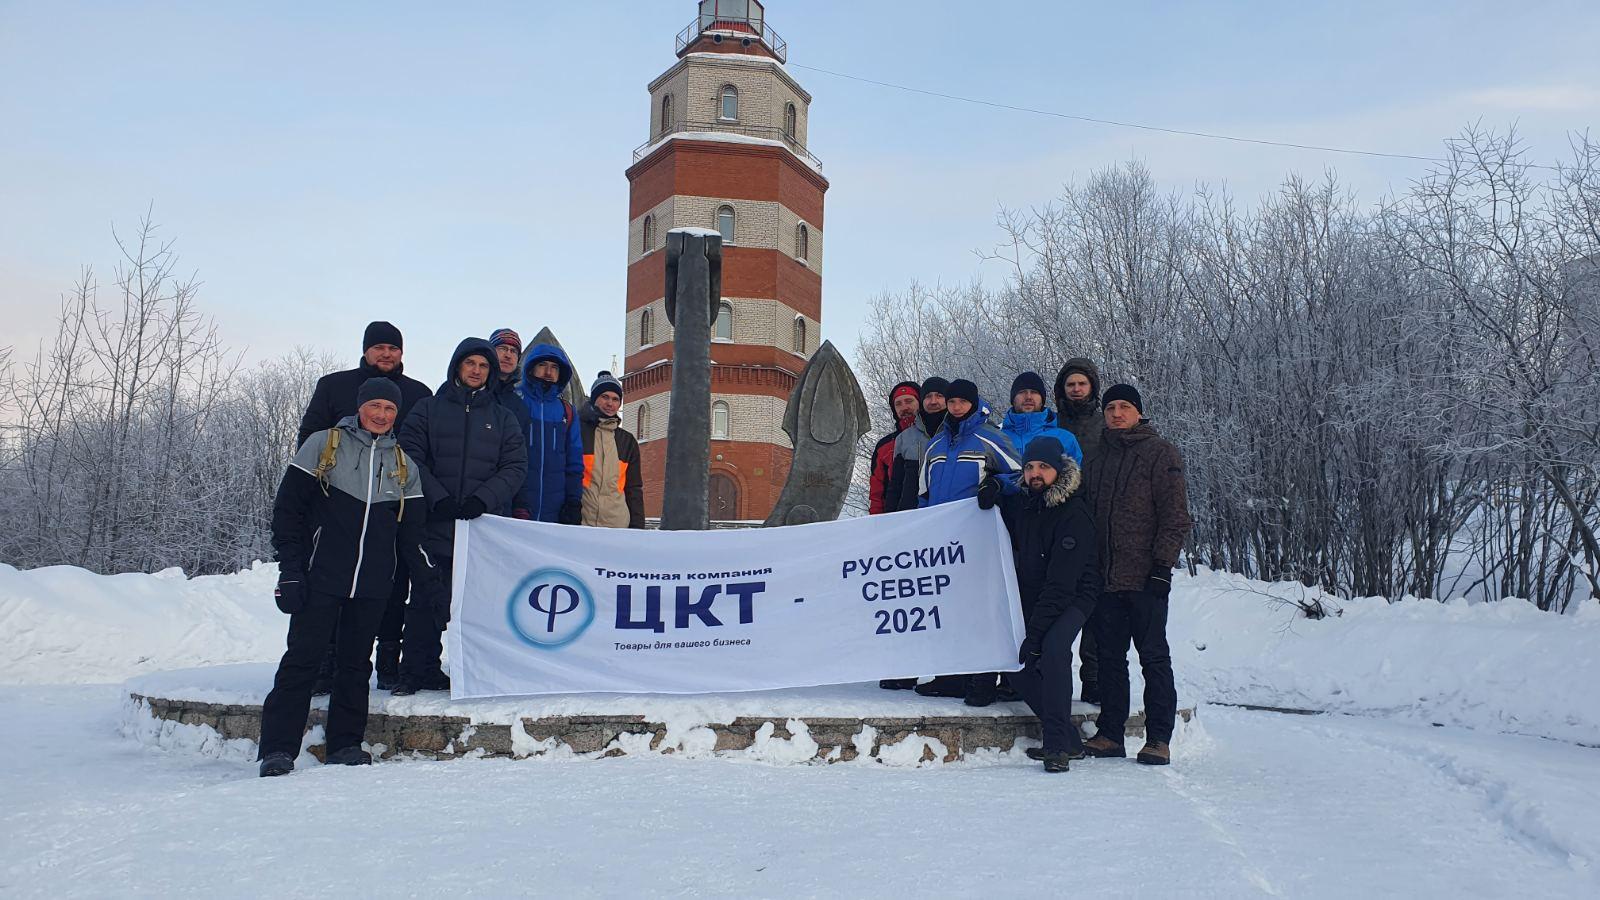 Экспедиция команды ЦКТ на север 2021